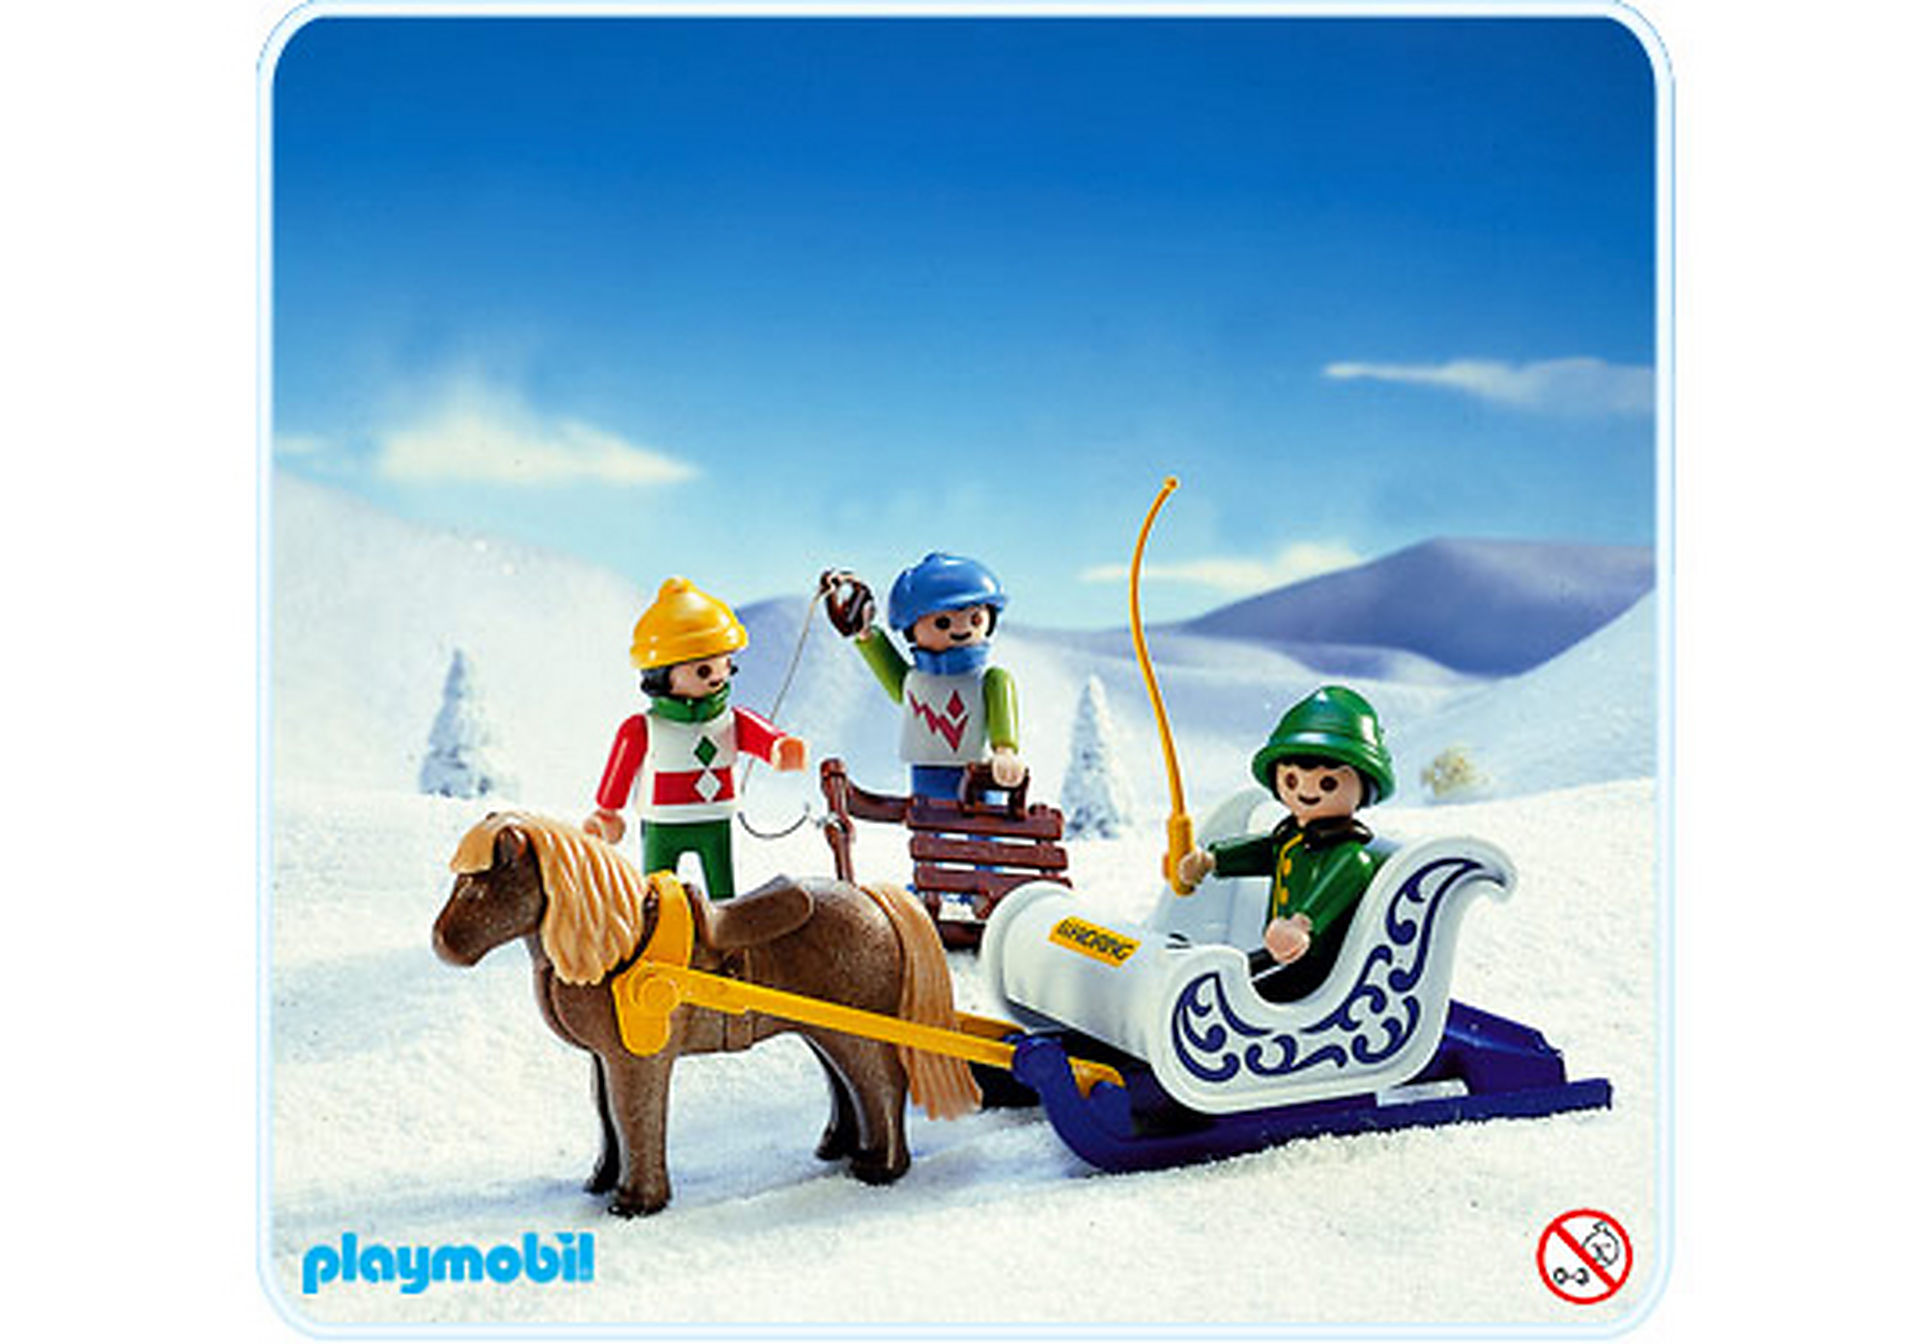 http://media.playmobil.com/i/playmobil/3689-A_product_detail/Ponyschlitten